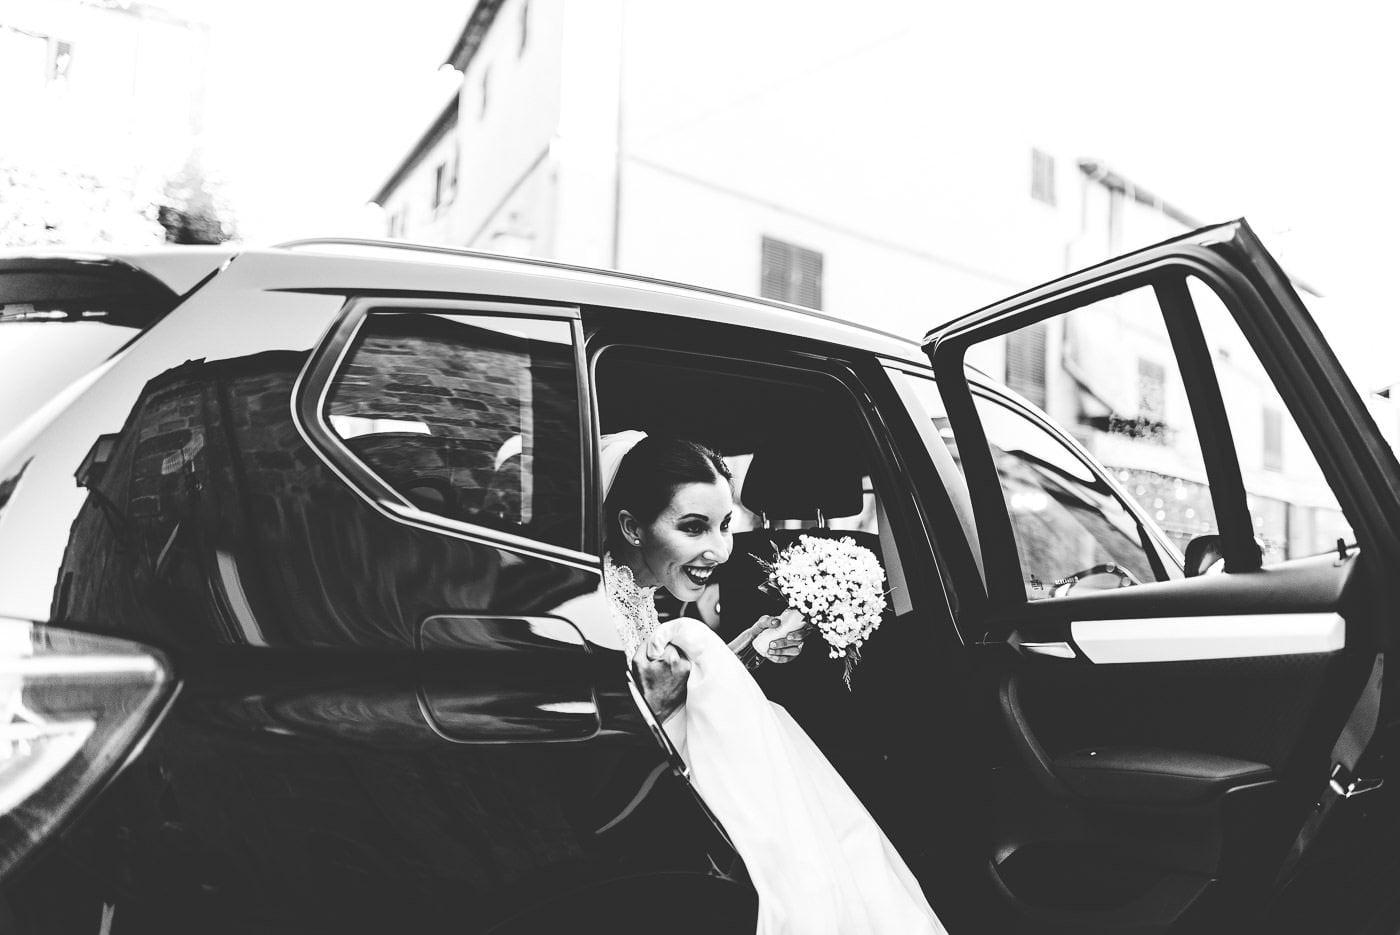 Matrimonio Giulia & Alessandro 28_12 – Alessio Nobili Photographer-15